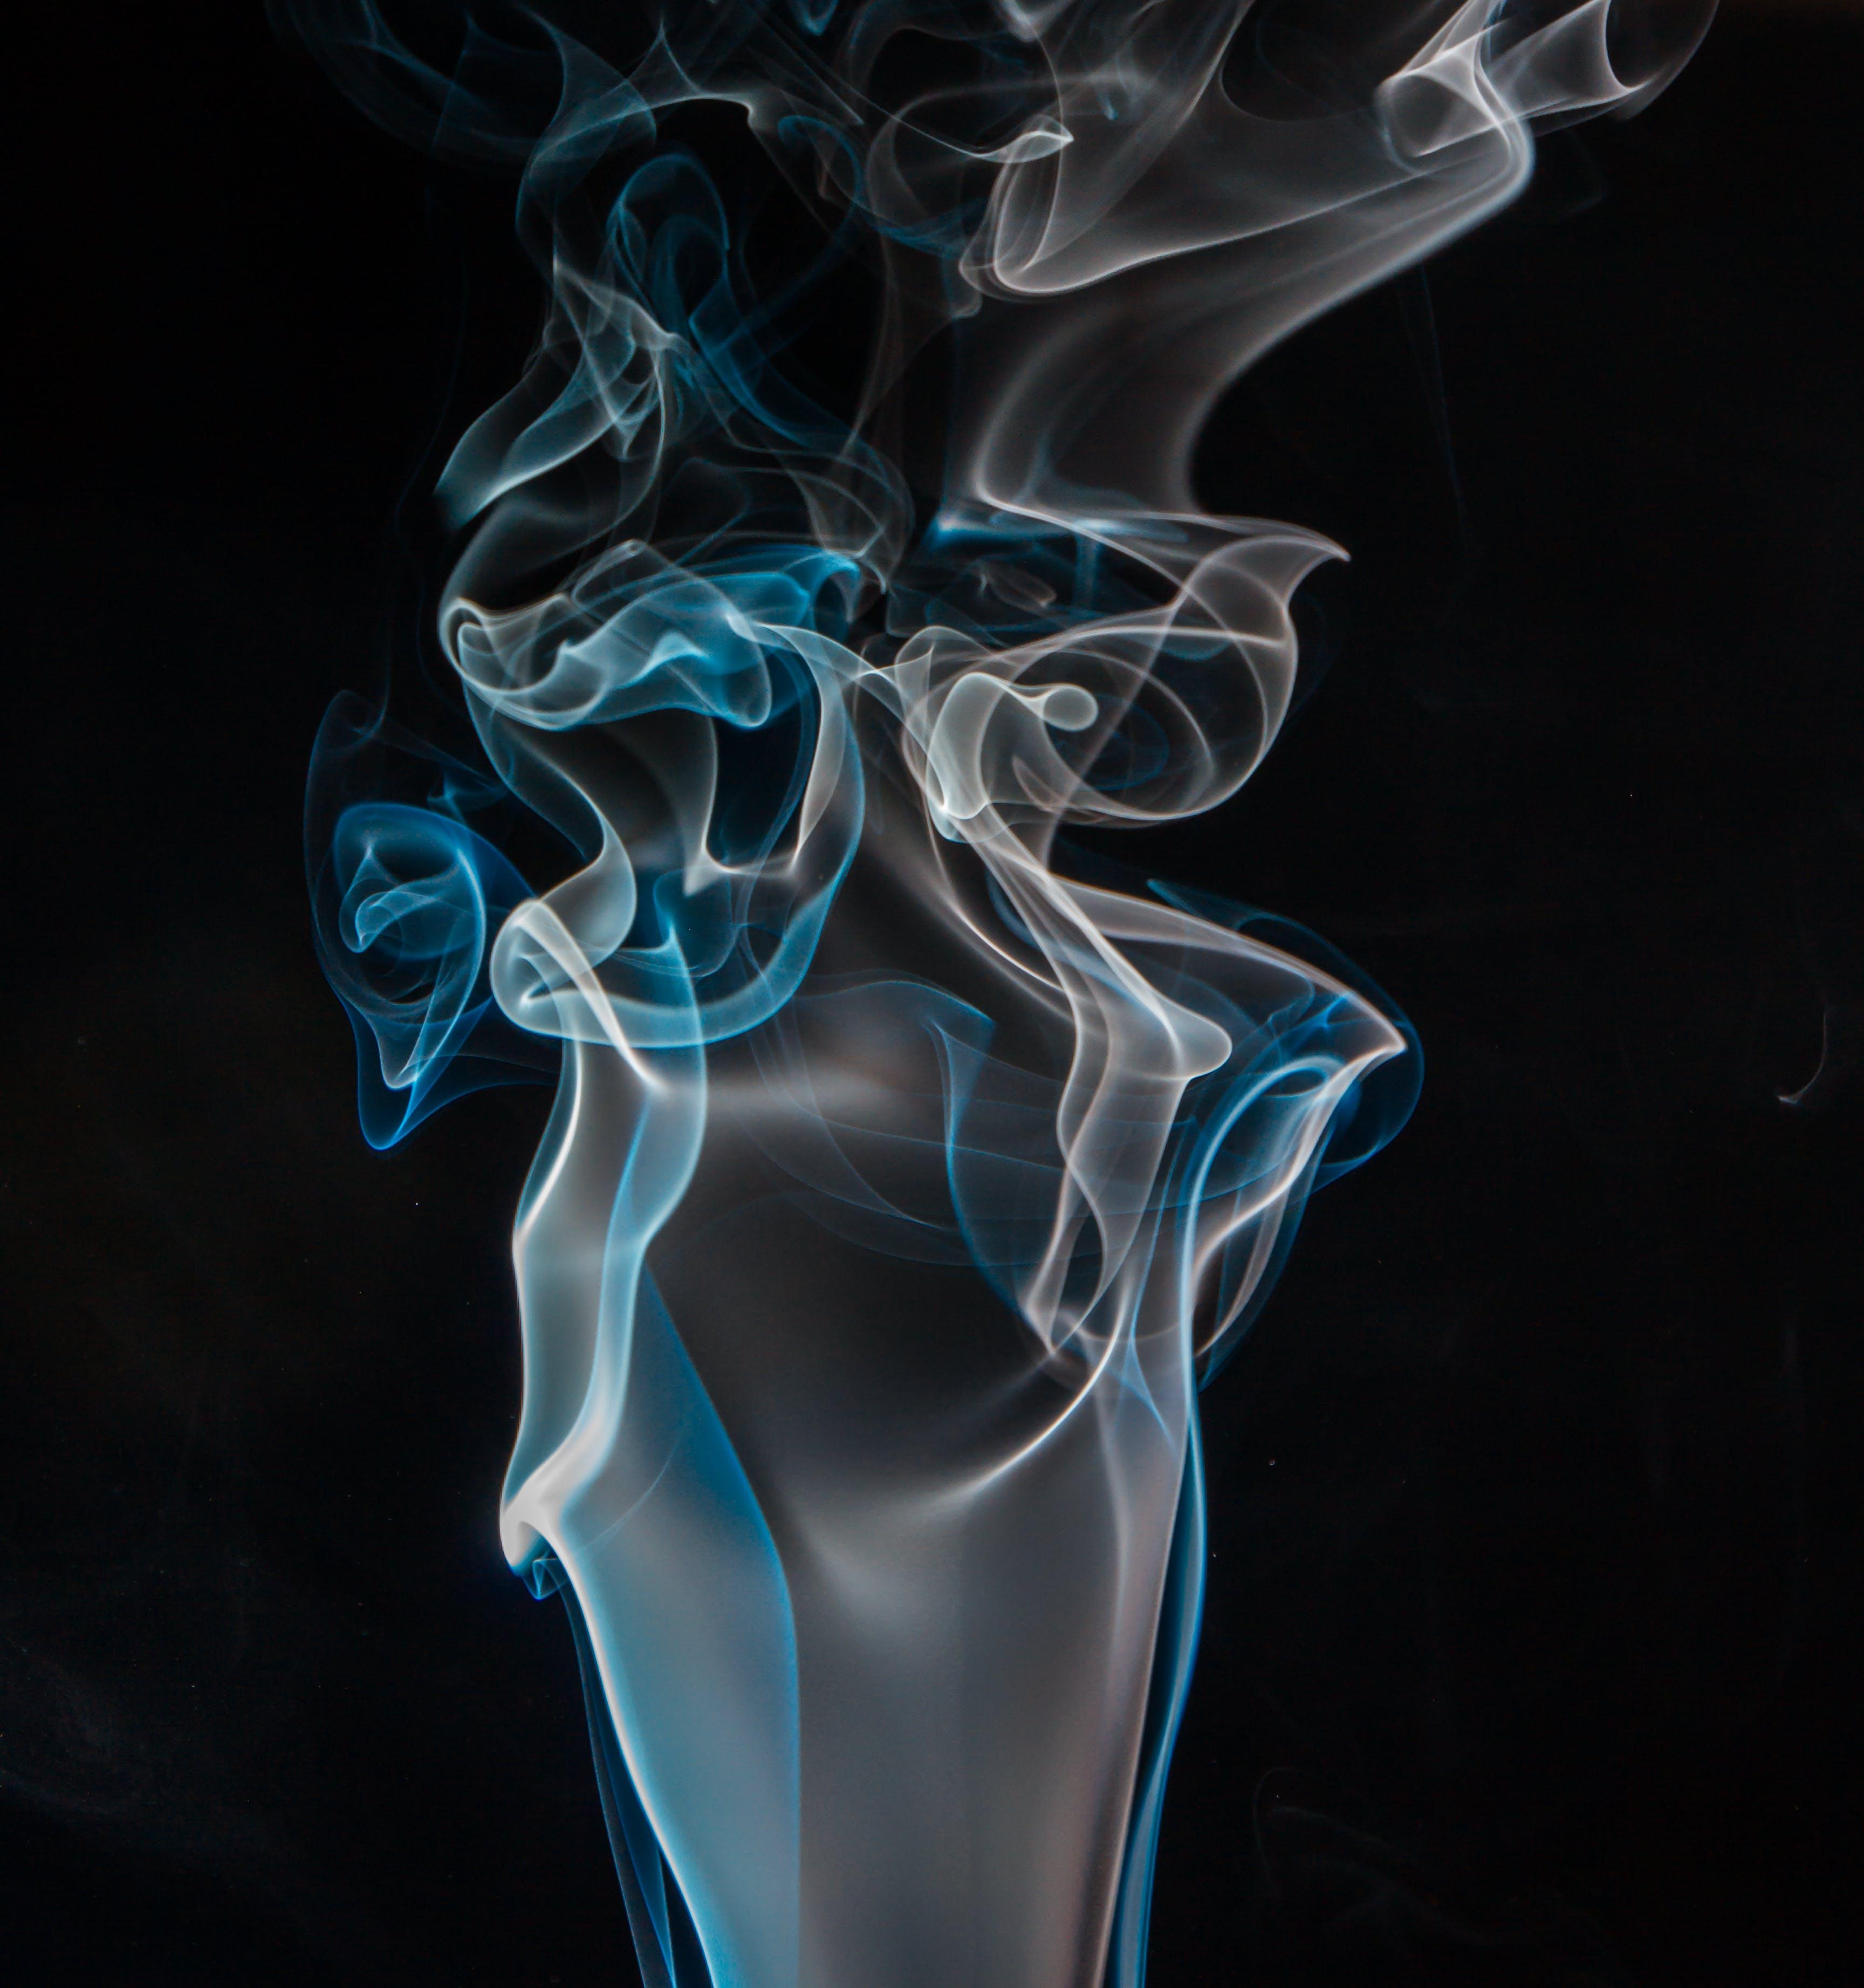 Blue and White Smoke Digital Wallpaper